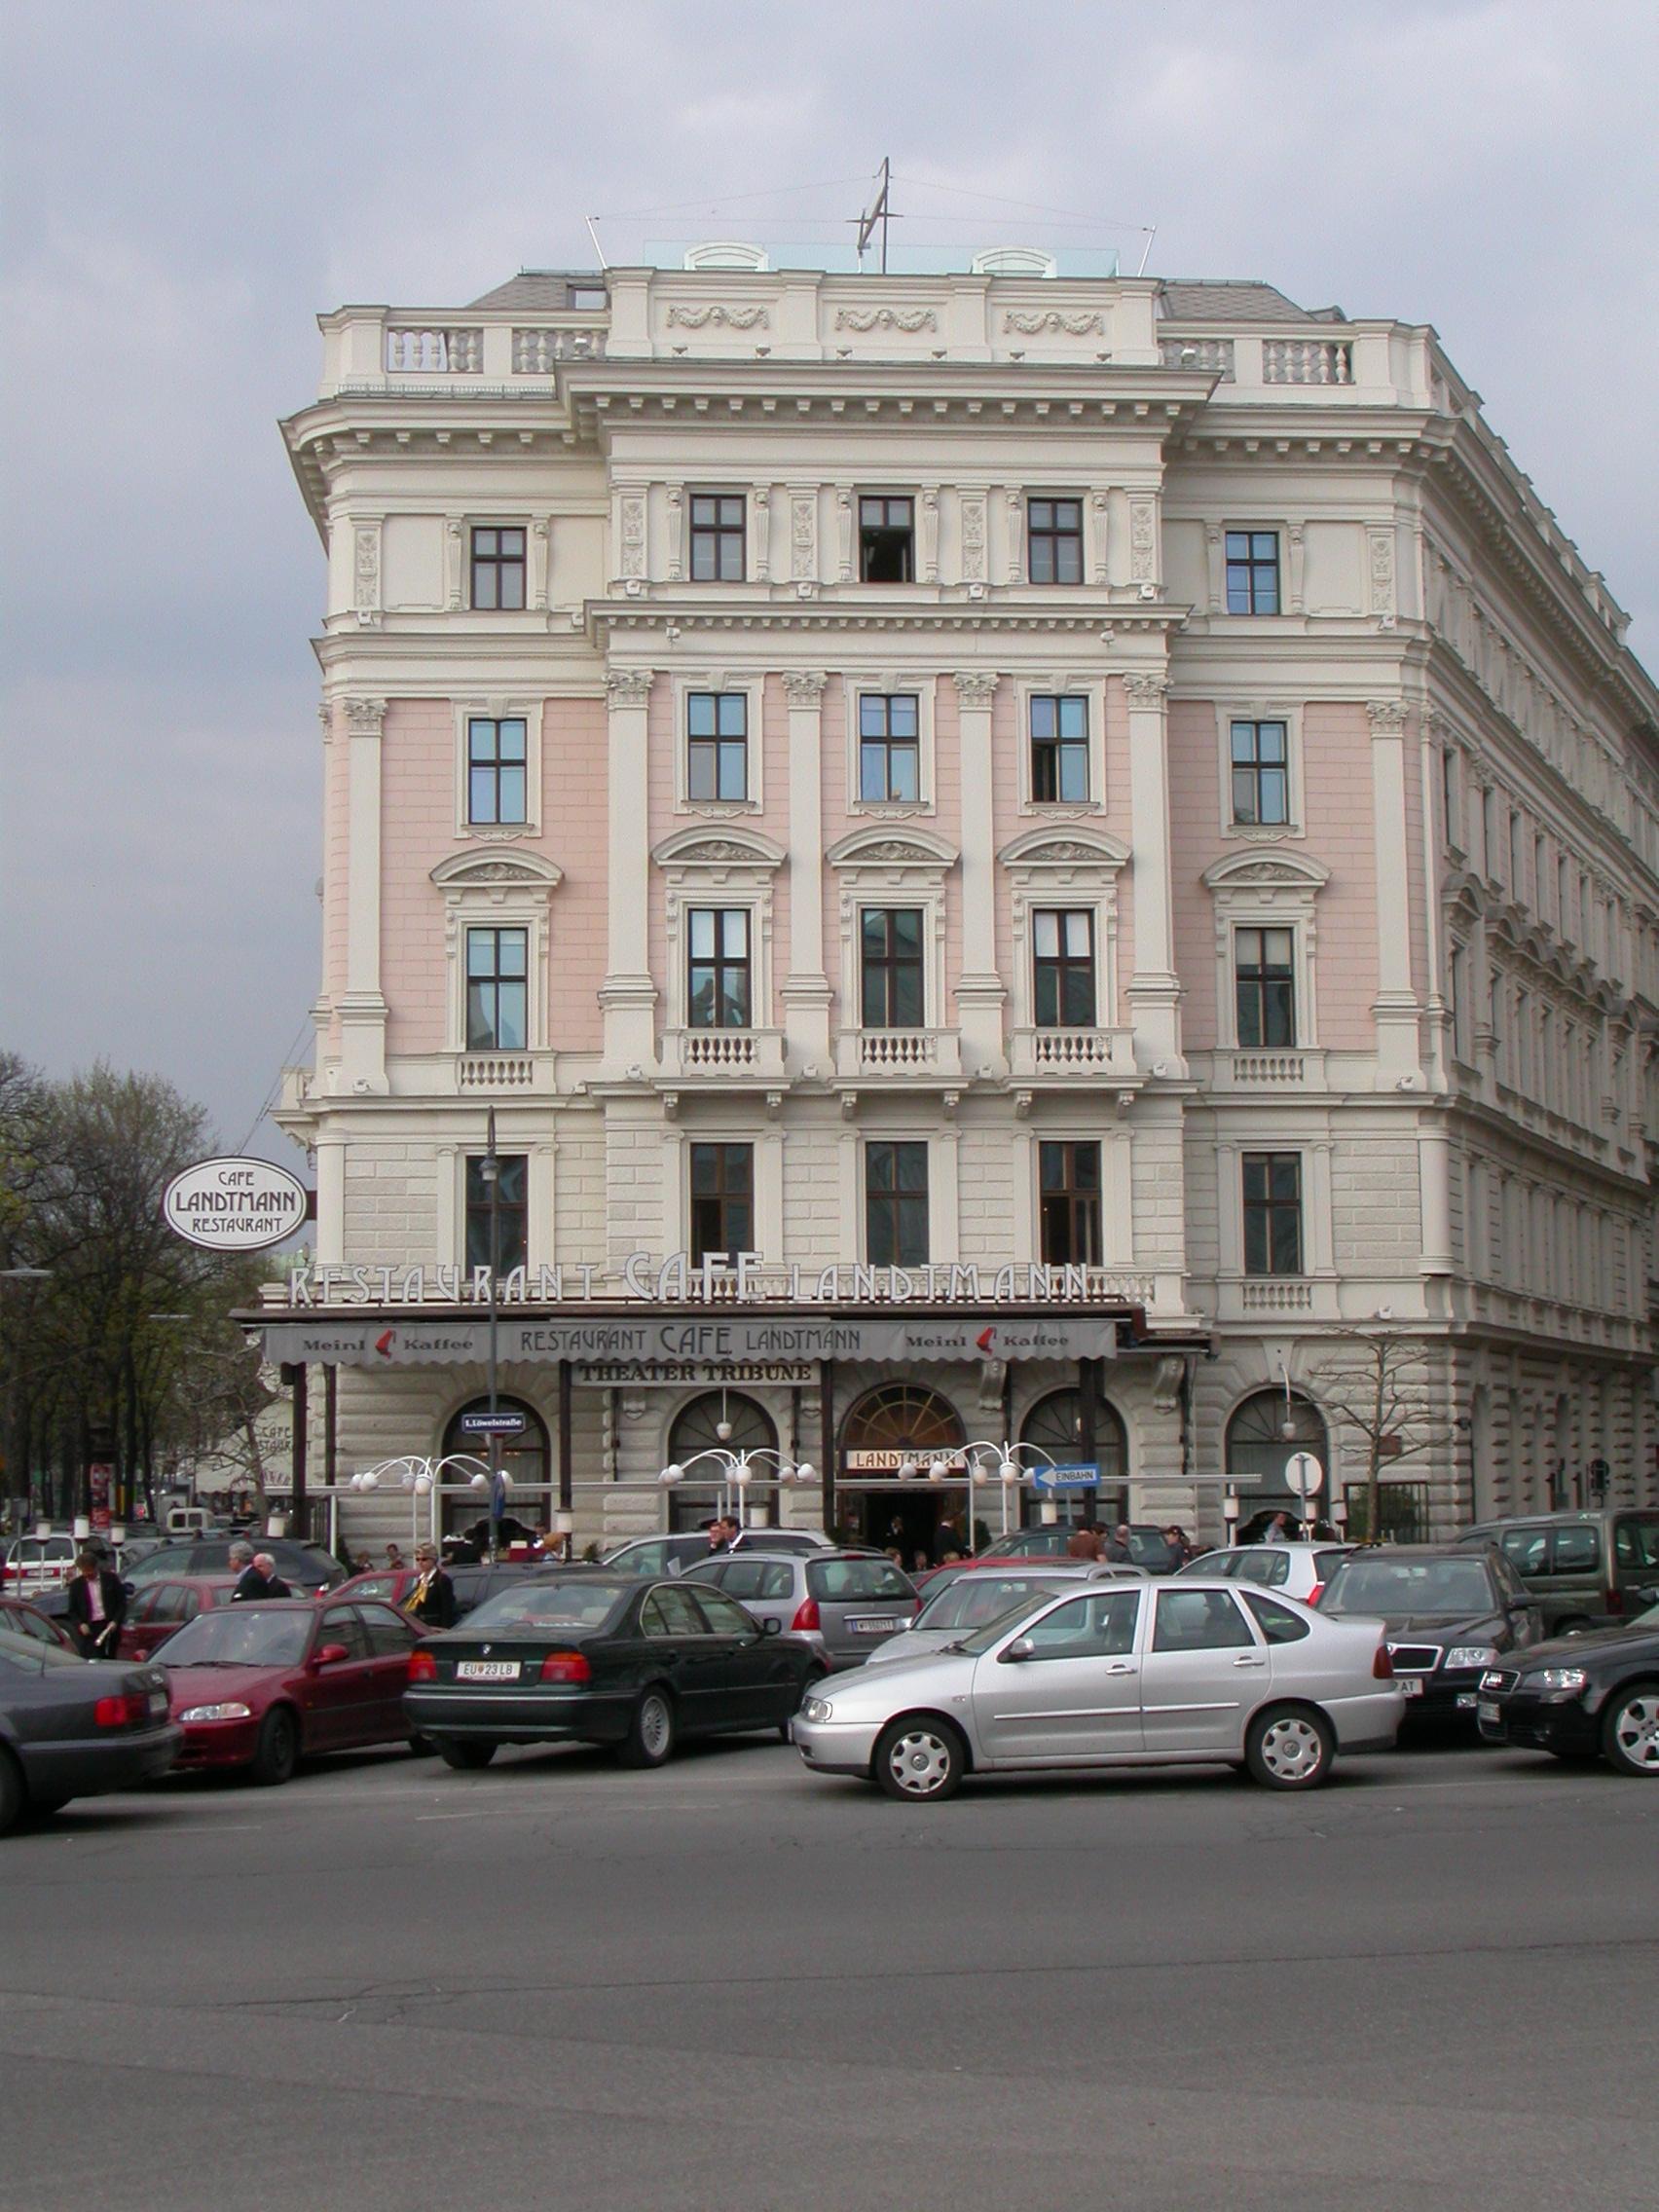 Café Landtmann (14370124458).jpg